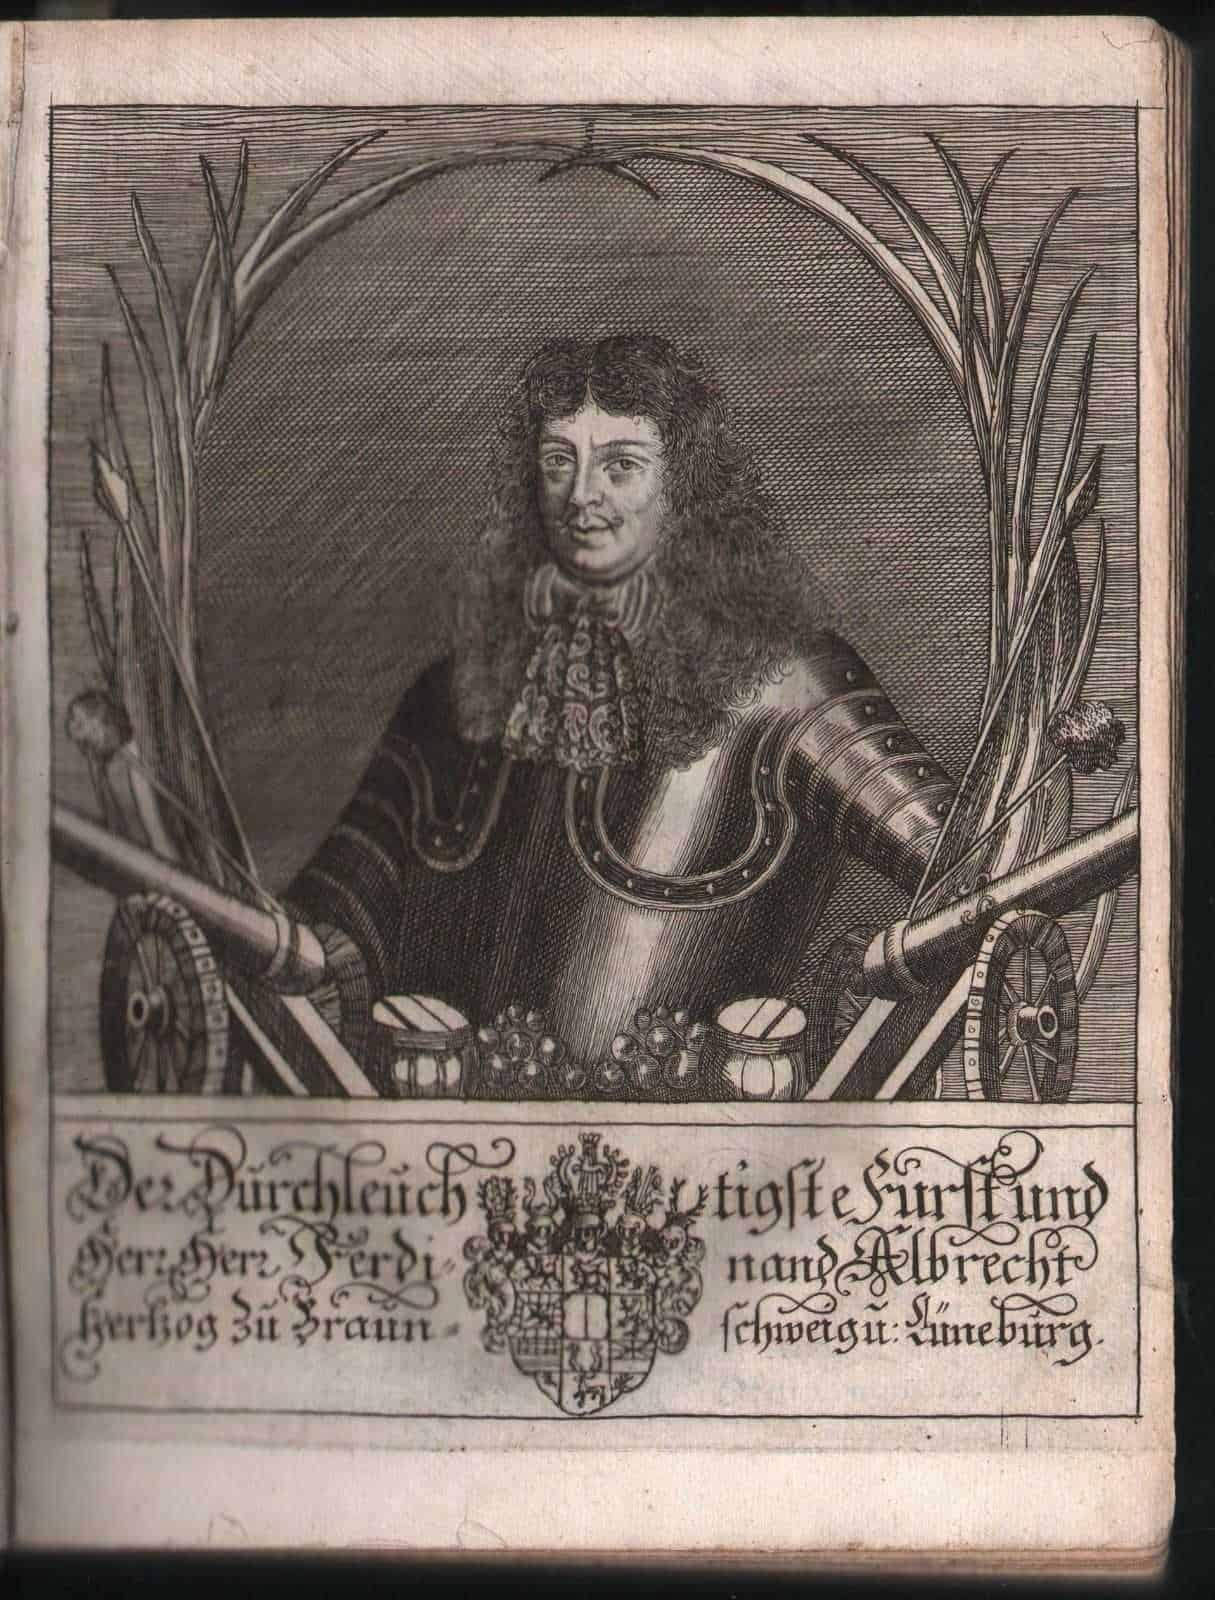 1688-Boethius-TRIUMPH-LEUCHTENDEN-KRIEGS-HELMS-Vol-3-History-Christian-Ottoman-401133054023-5